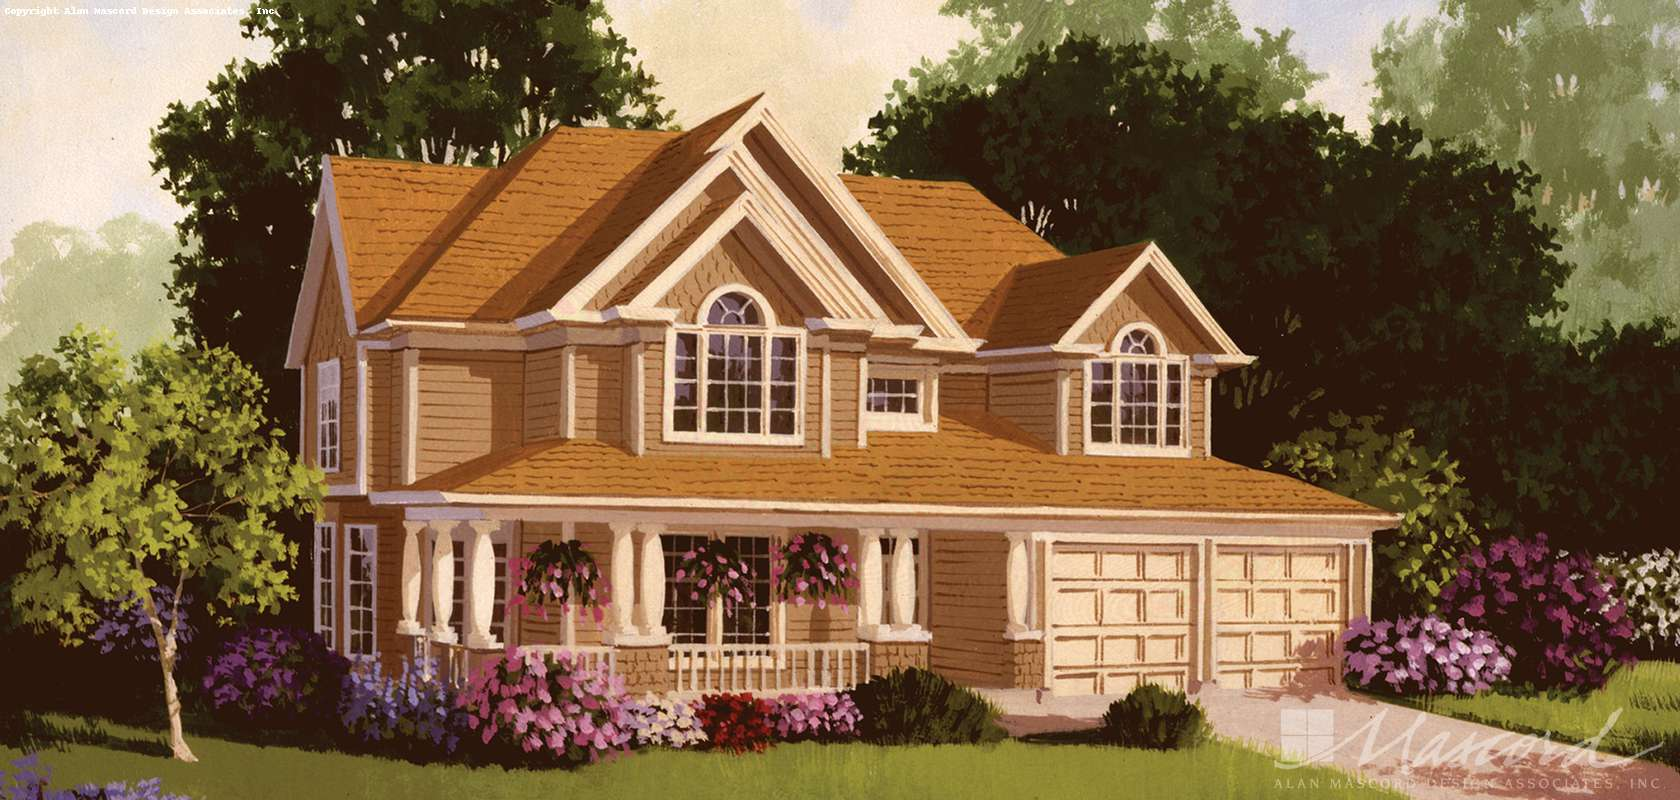 Mascord House Plan 2281: The Lyndon